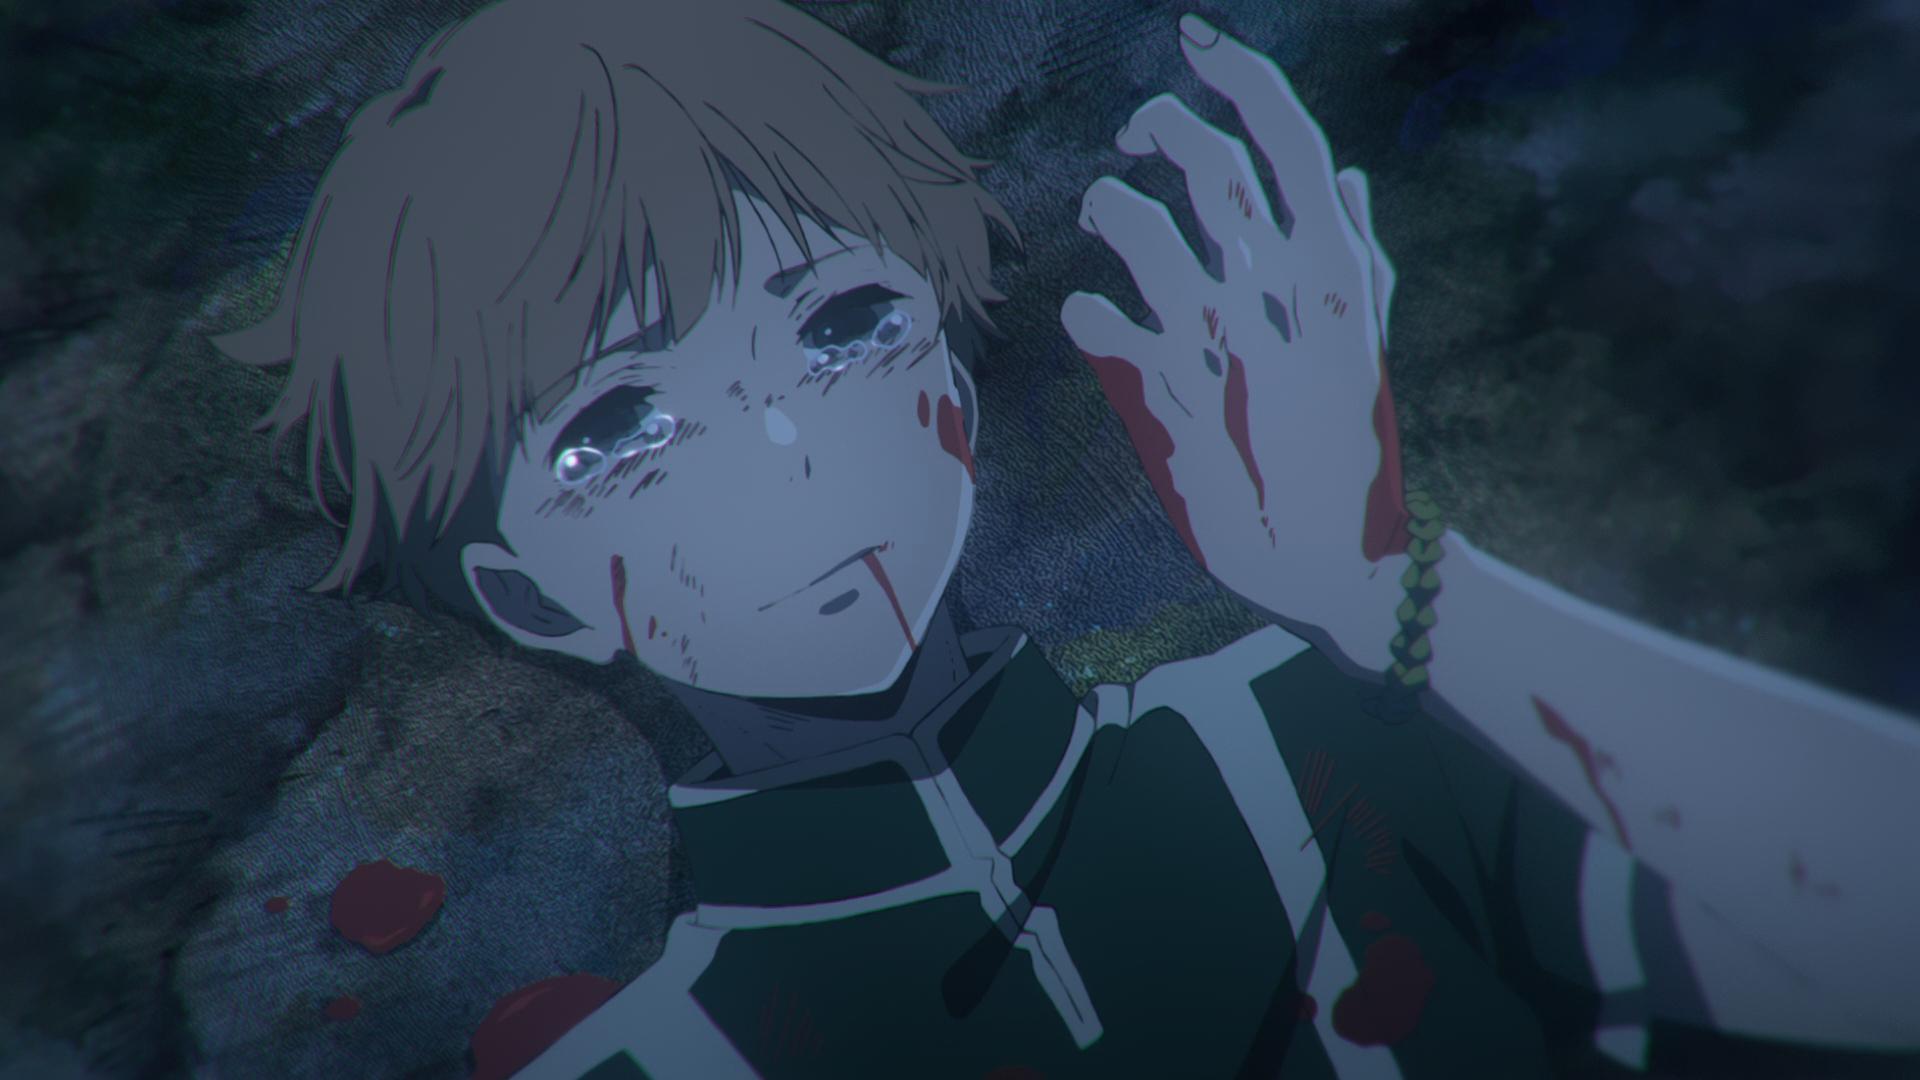 Very Sad Girl Boy Wallpaper Children Of The Whales 08 Anime Evo